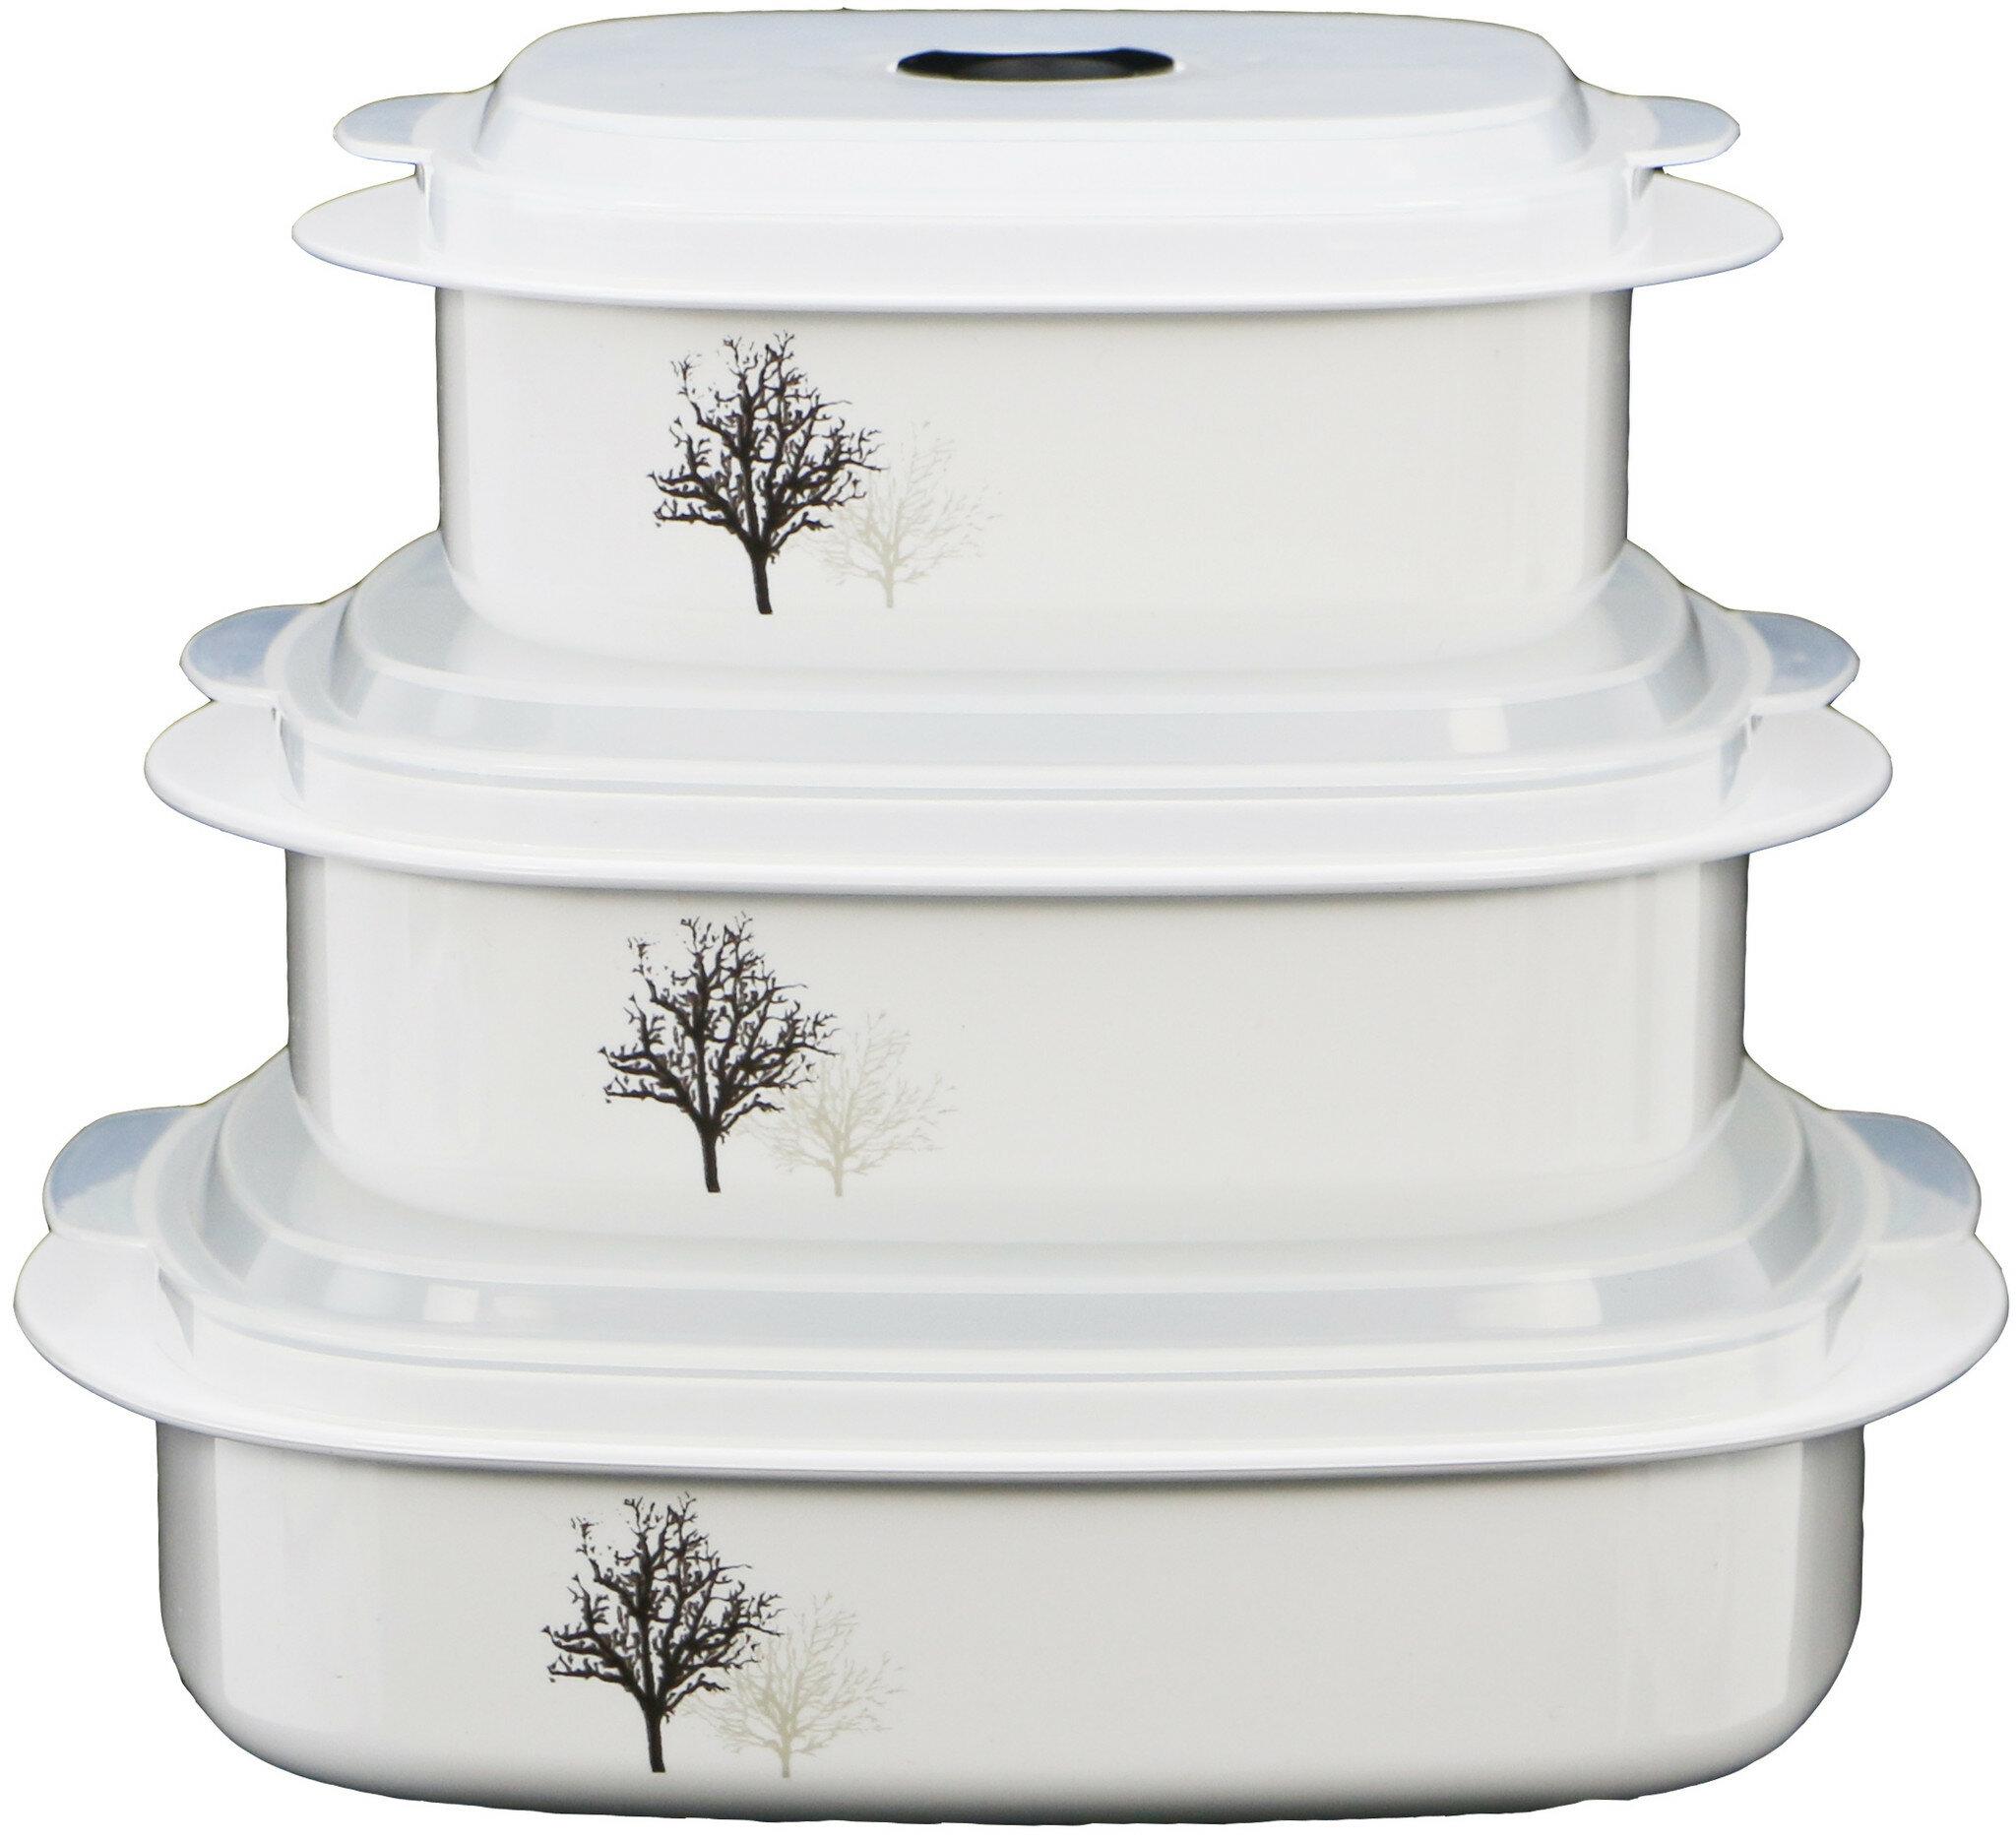 Corelle Coordinates 3 Container Food Storage Set Reviews Wayfair